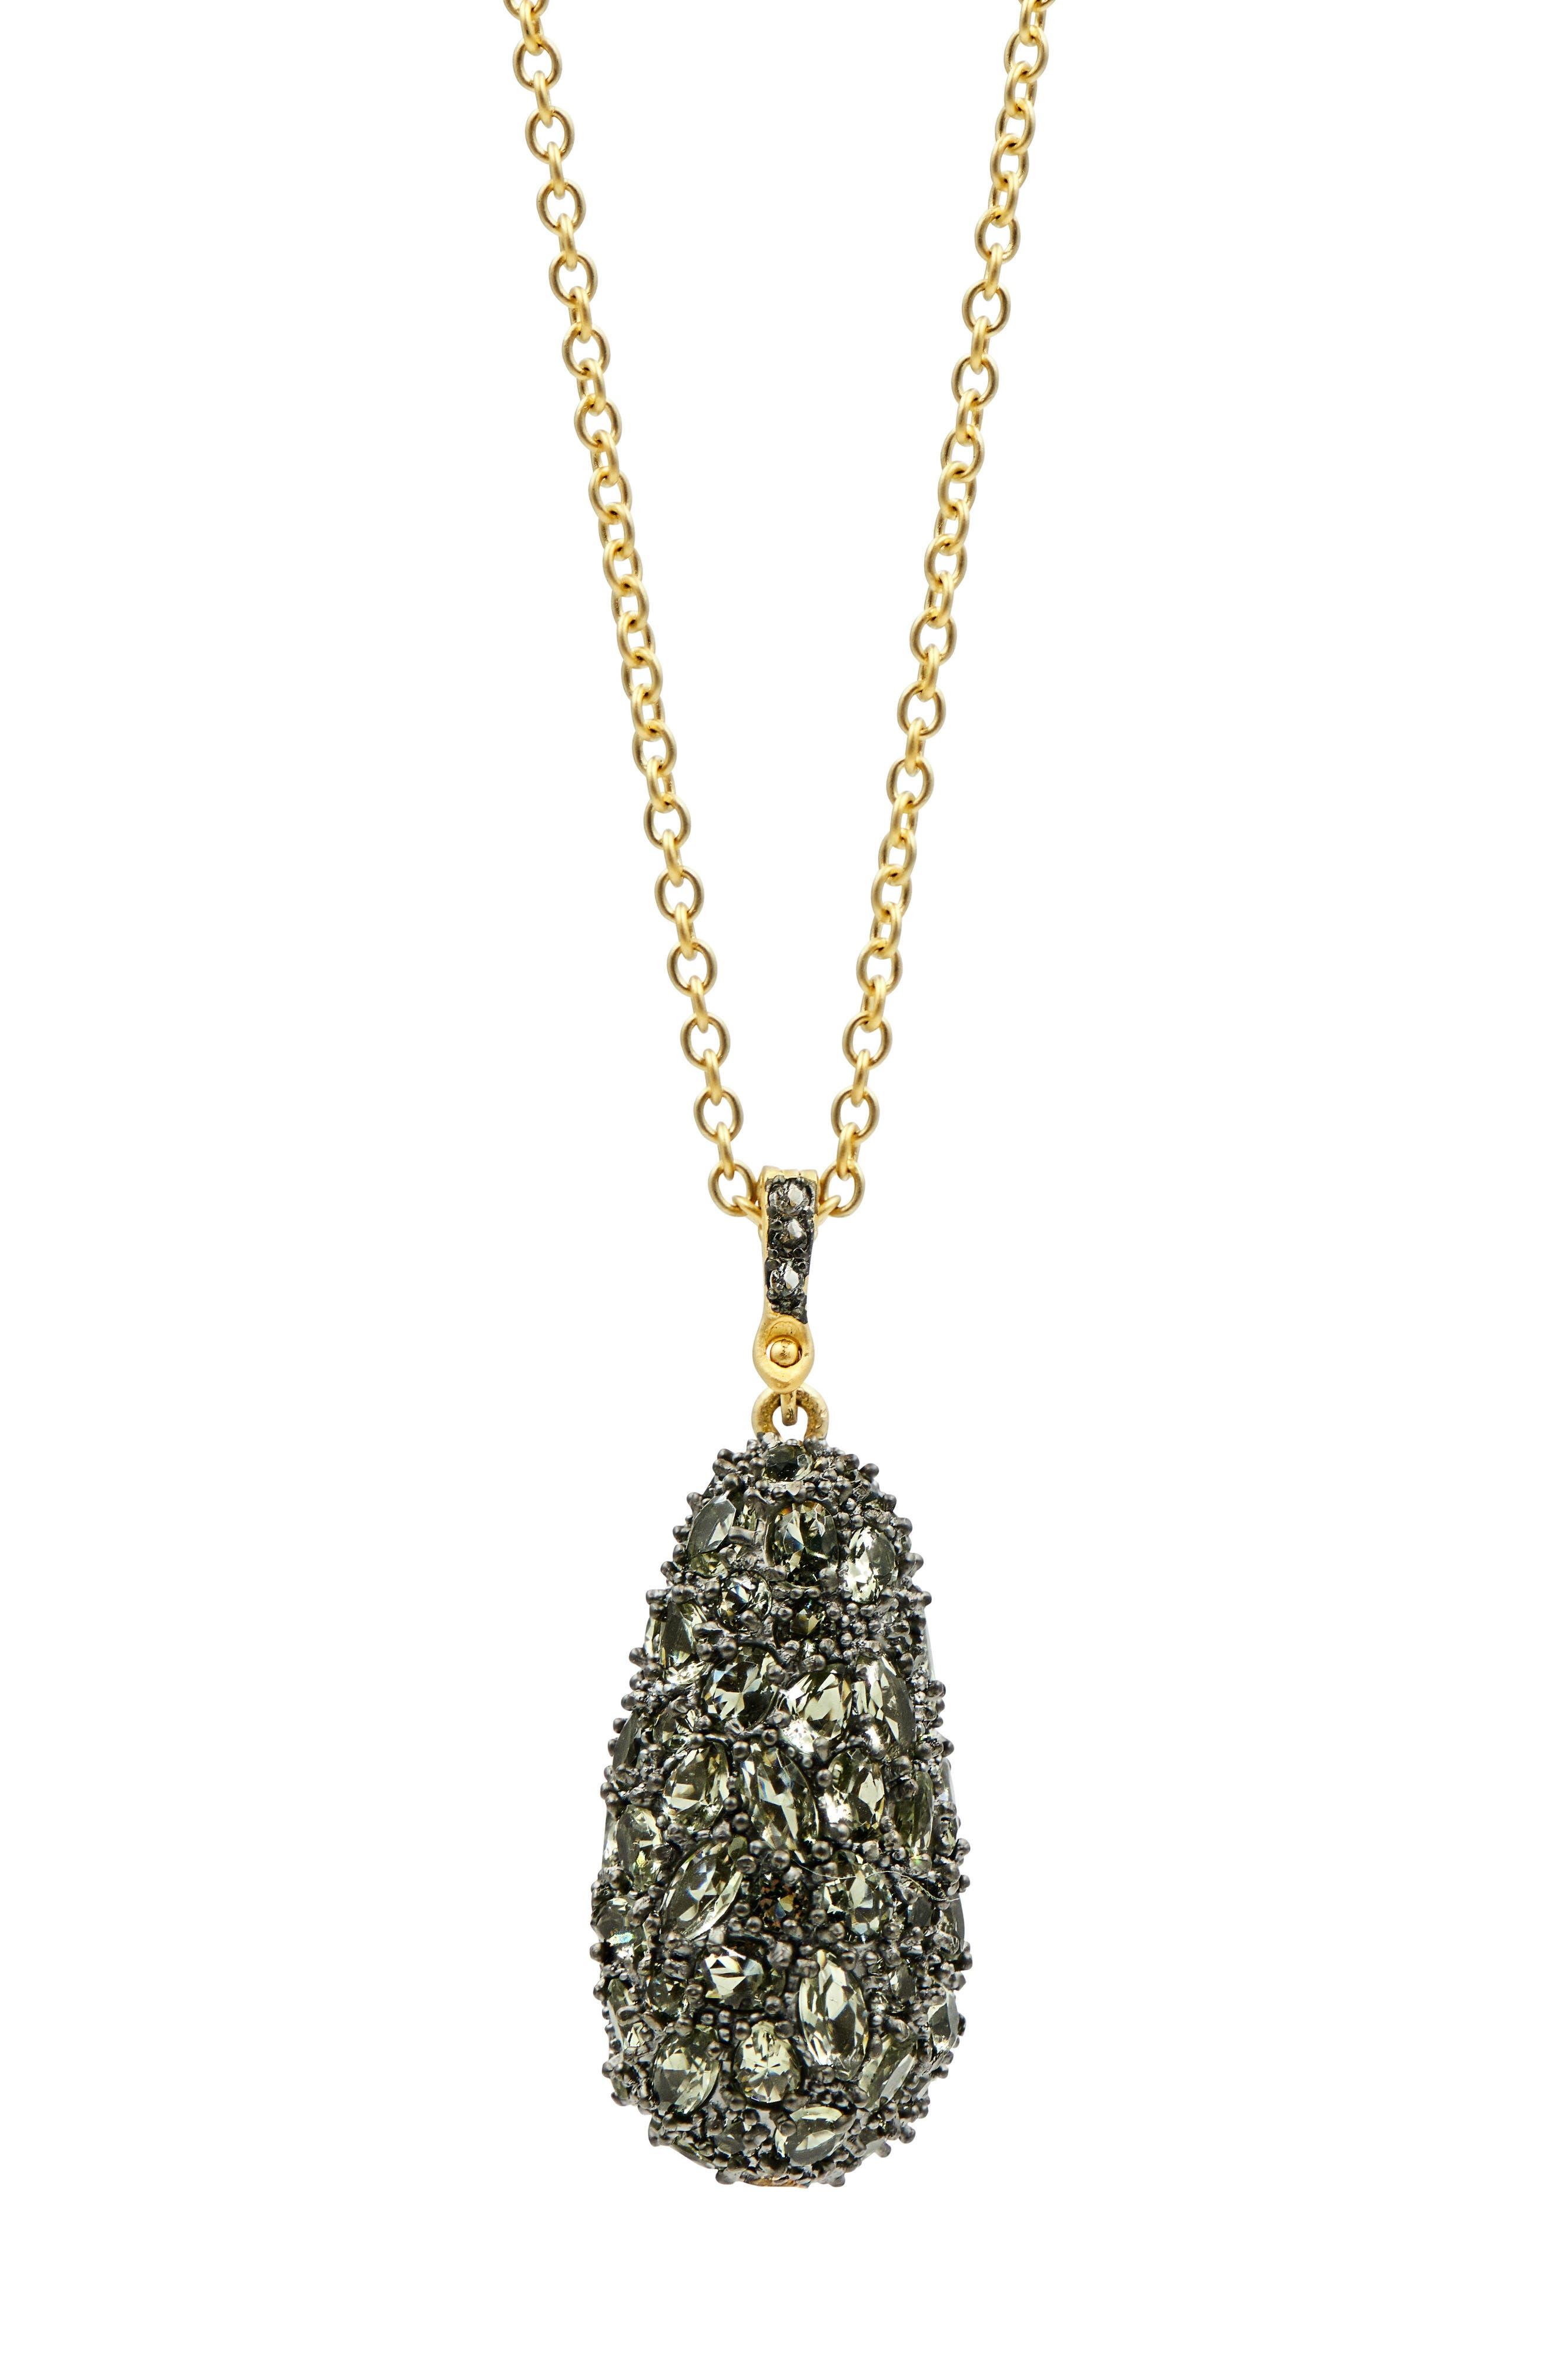 Pebblestone Long Pendant Necklace,                             Alternate thumbnail 3, color,                             710